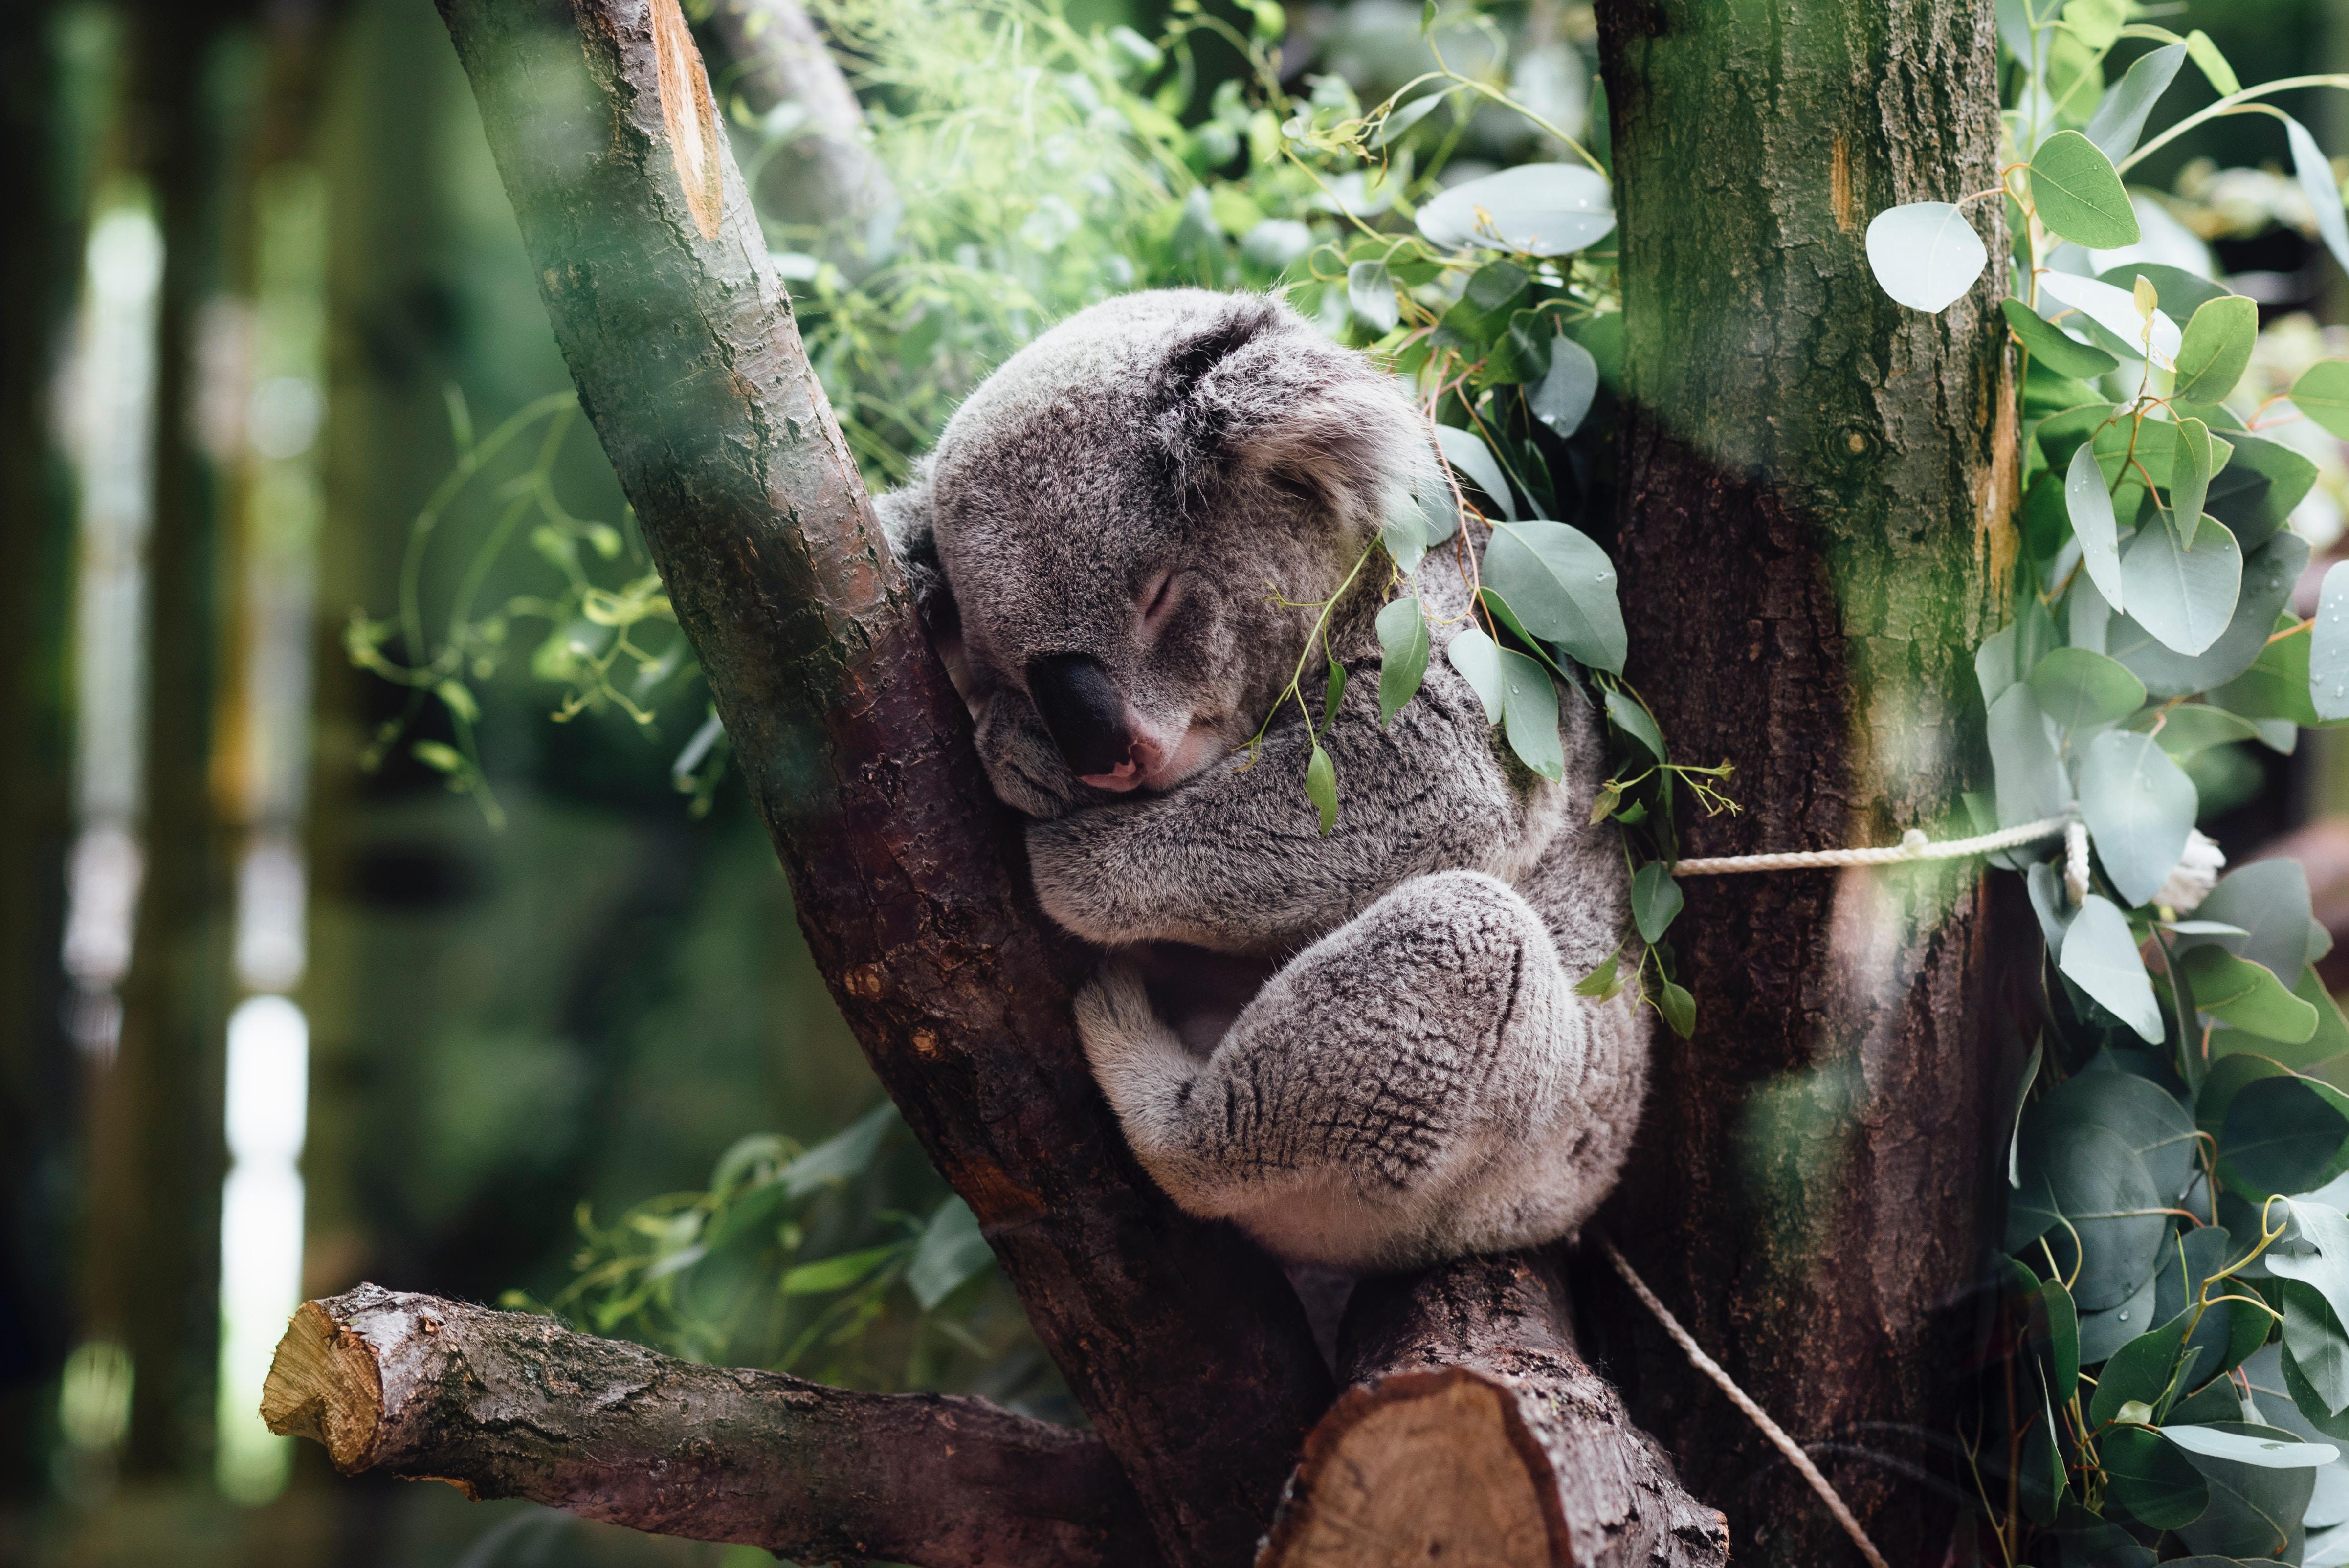 A koala sleeping between large tree branches.